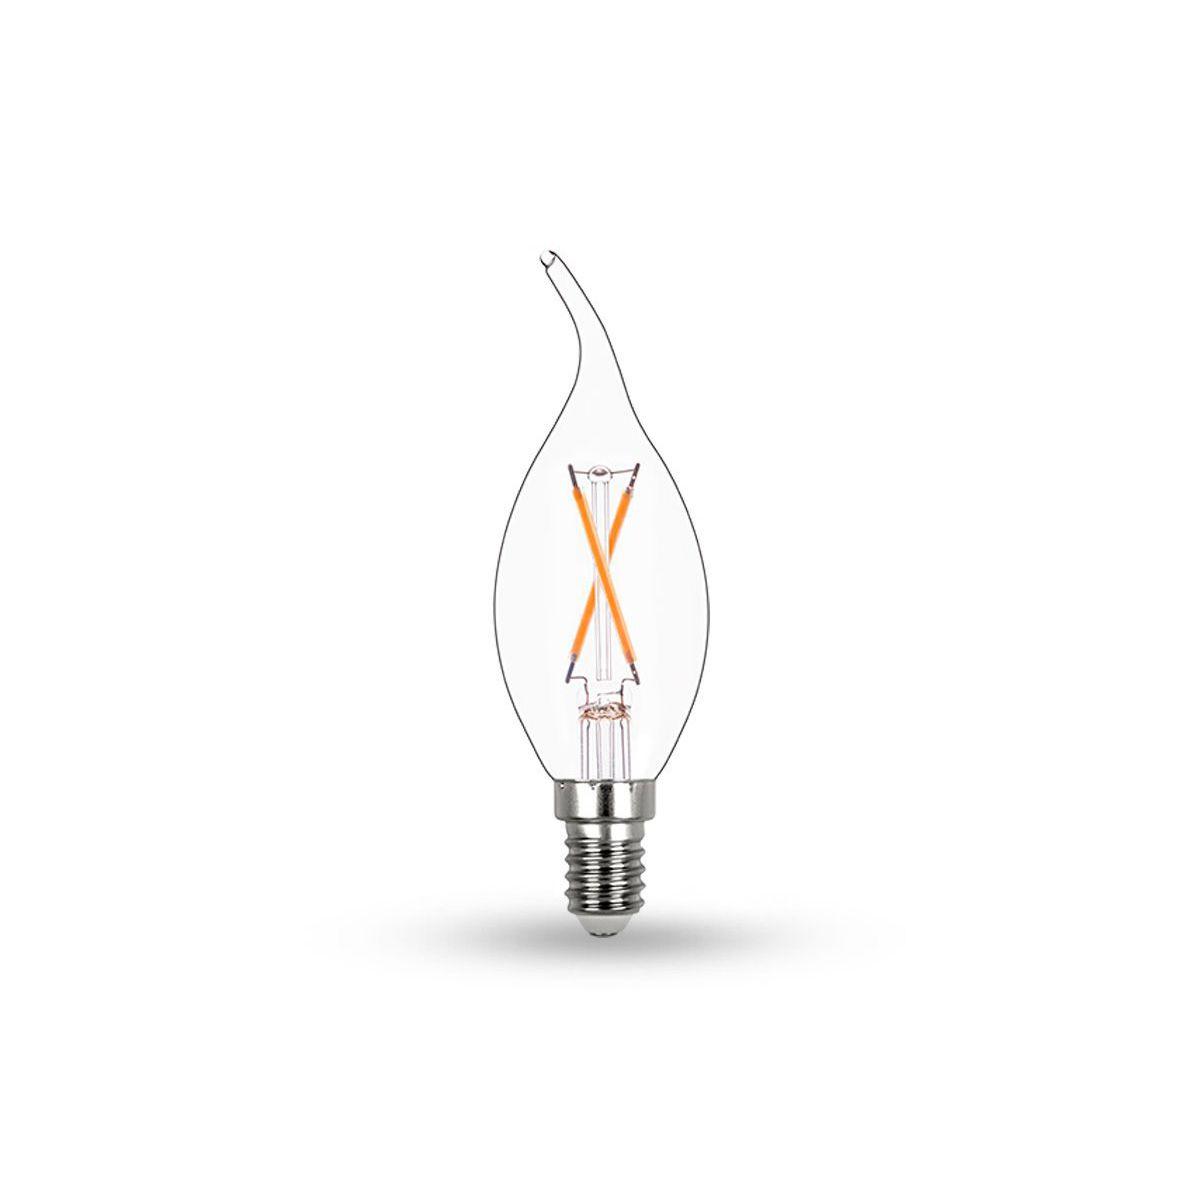 Lâmpada LED Vela Chama Filamento Translúcido E14 2W 2700K 220V - STH7312/27 Stella